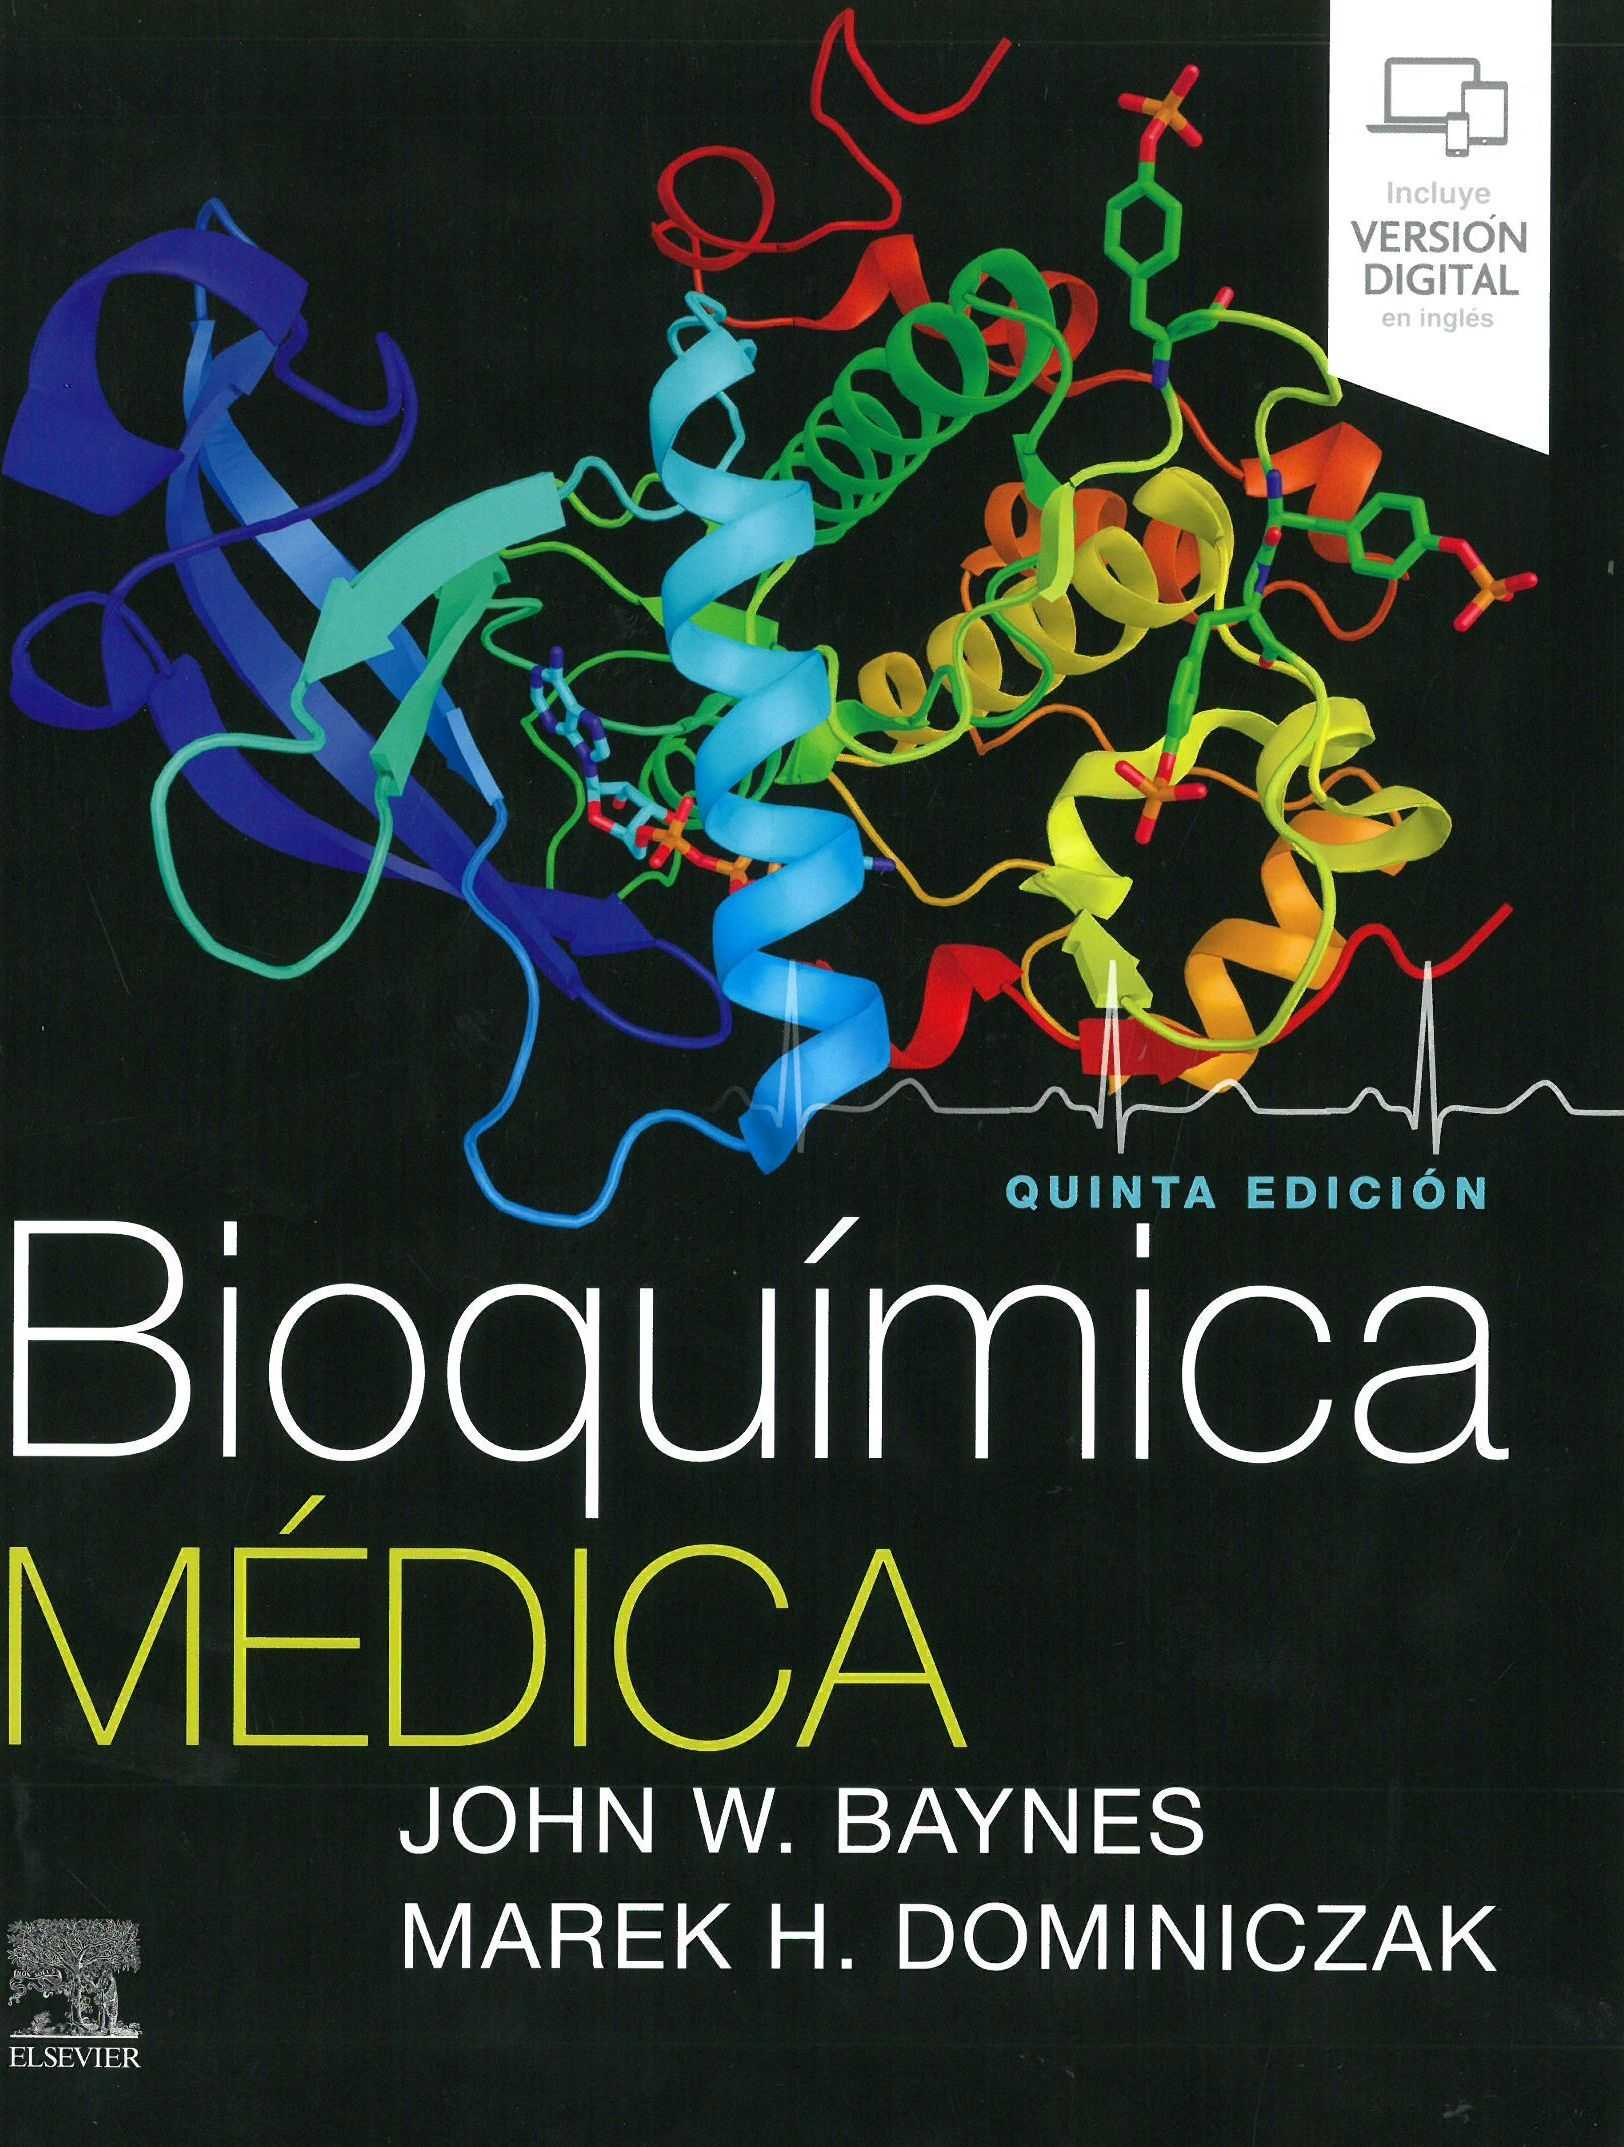 Bioquímica Médica John Baynes Marek H Dominiczak Edición 5ª Ed Books Medica John